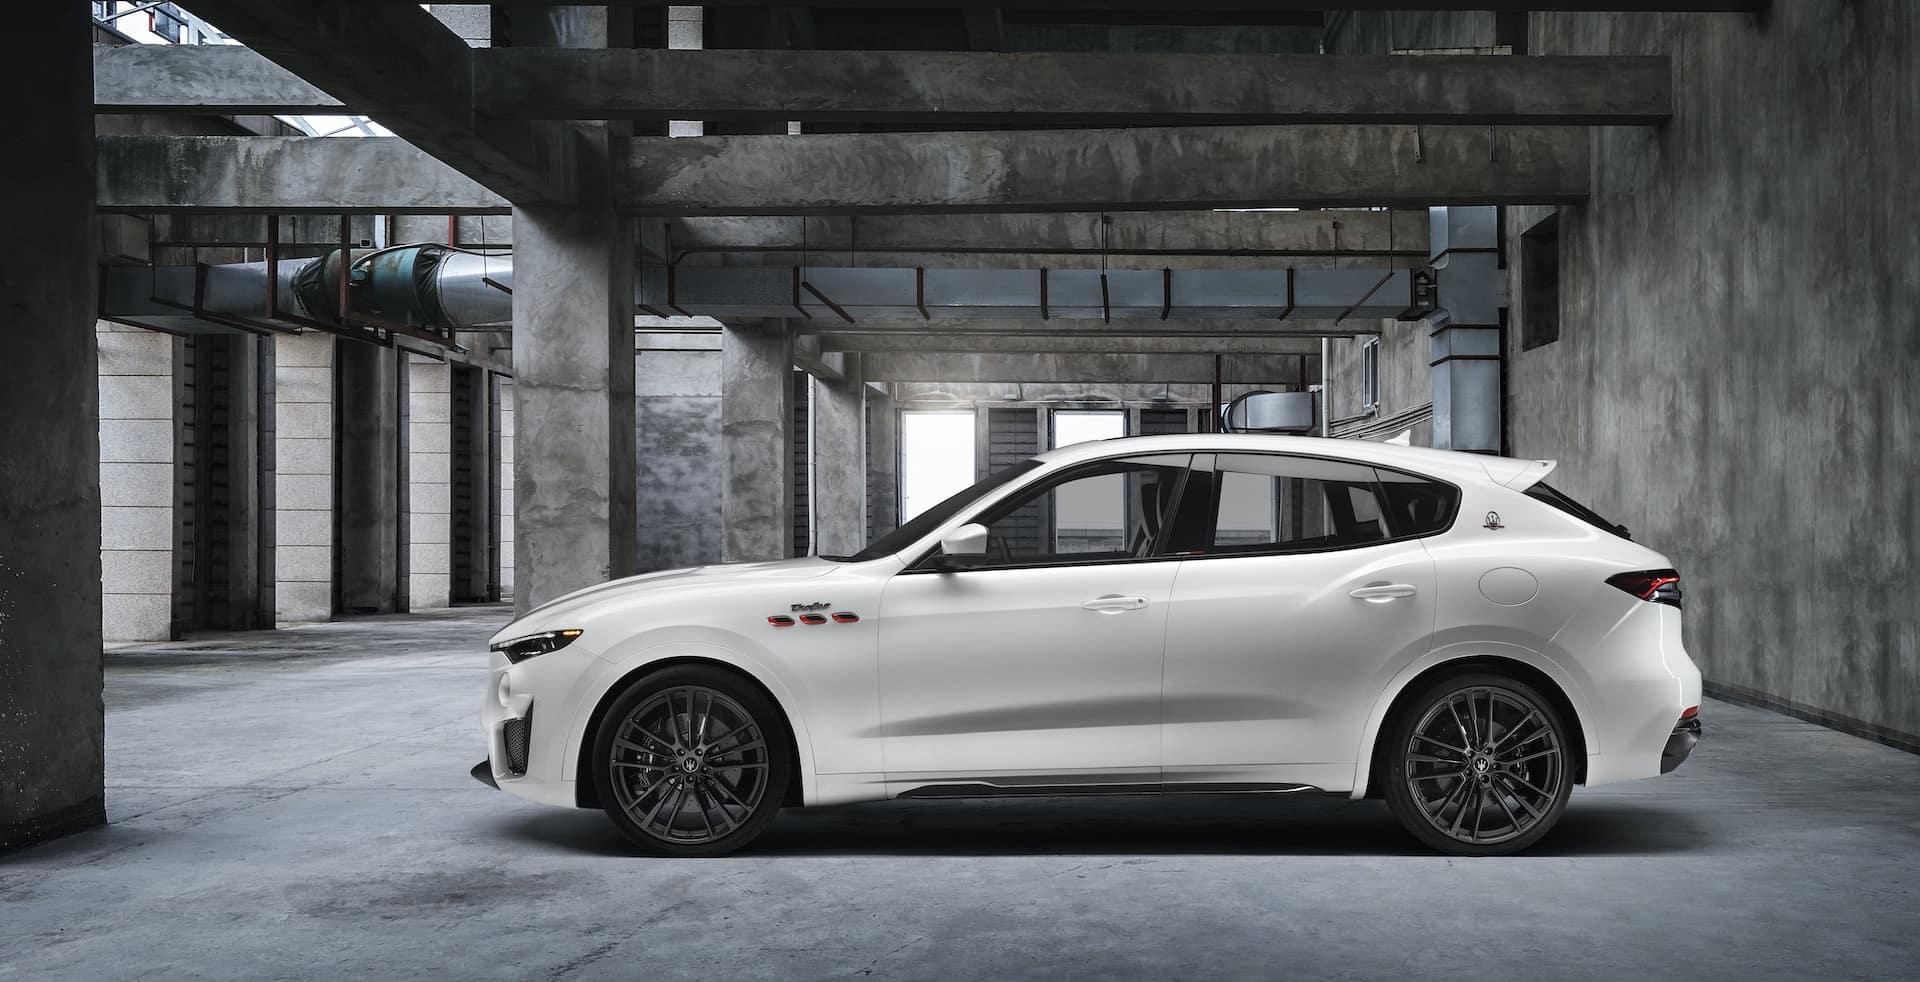 2020 Maserati Levante parked in garage   Bennett Maserati of Allentown is a Car Dealership near Reading PA in Allentown